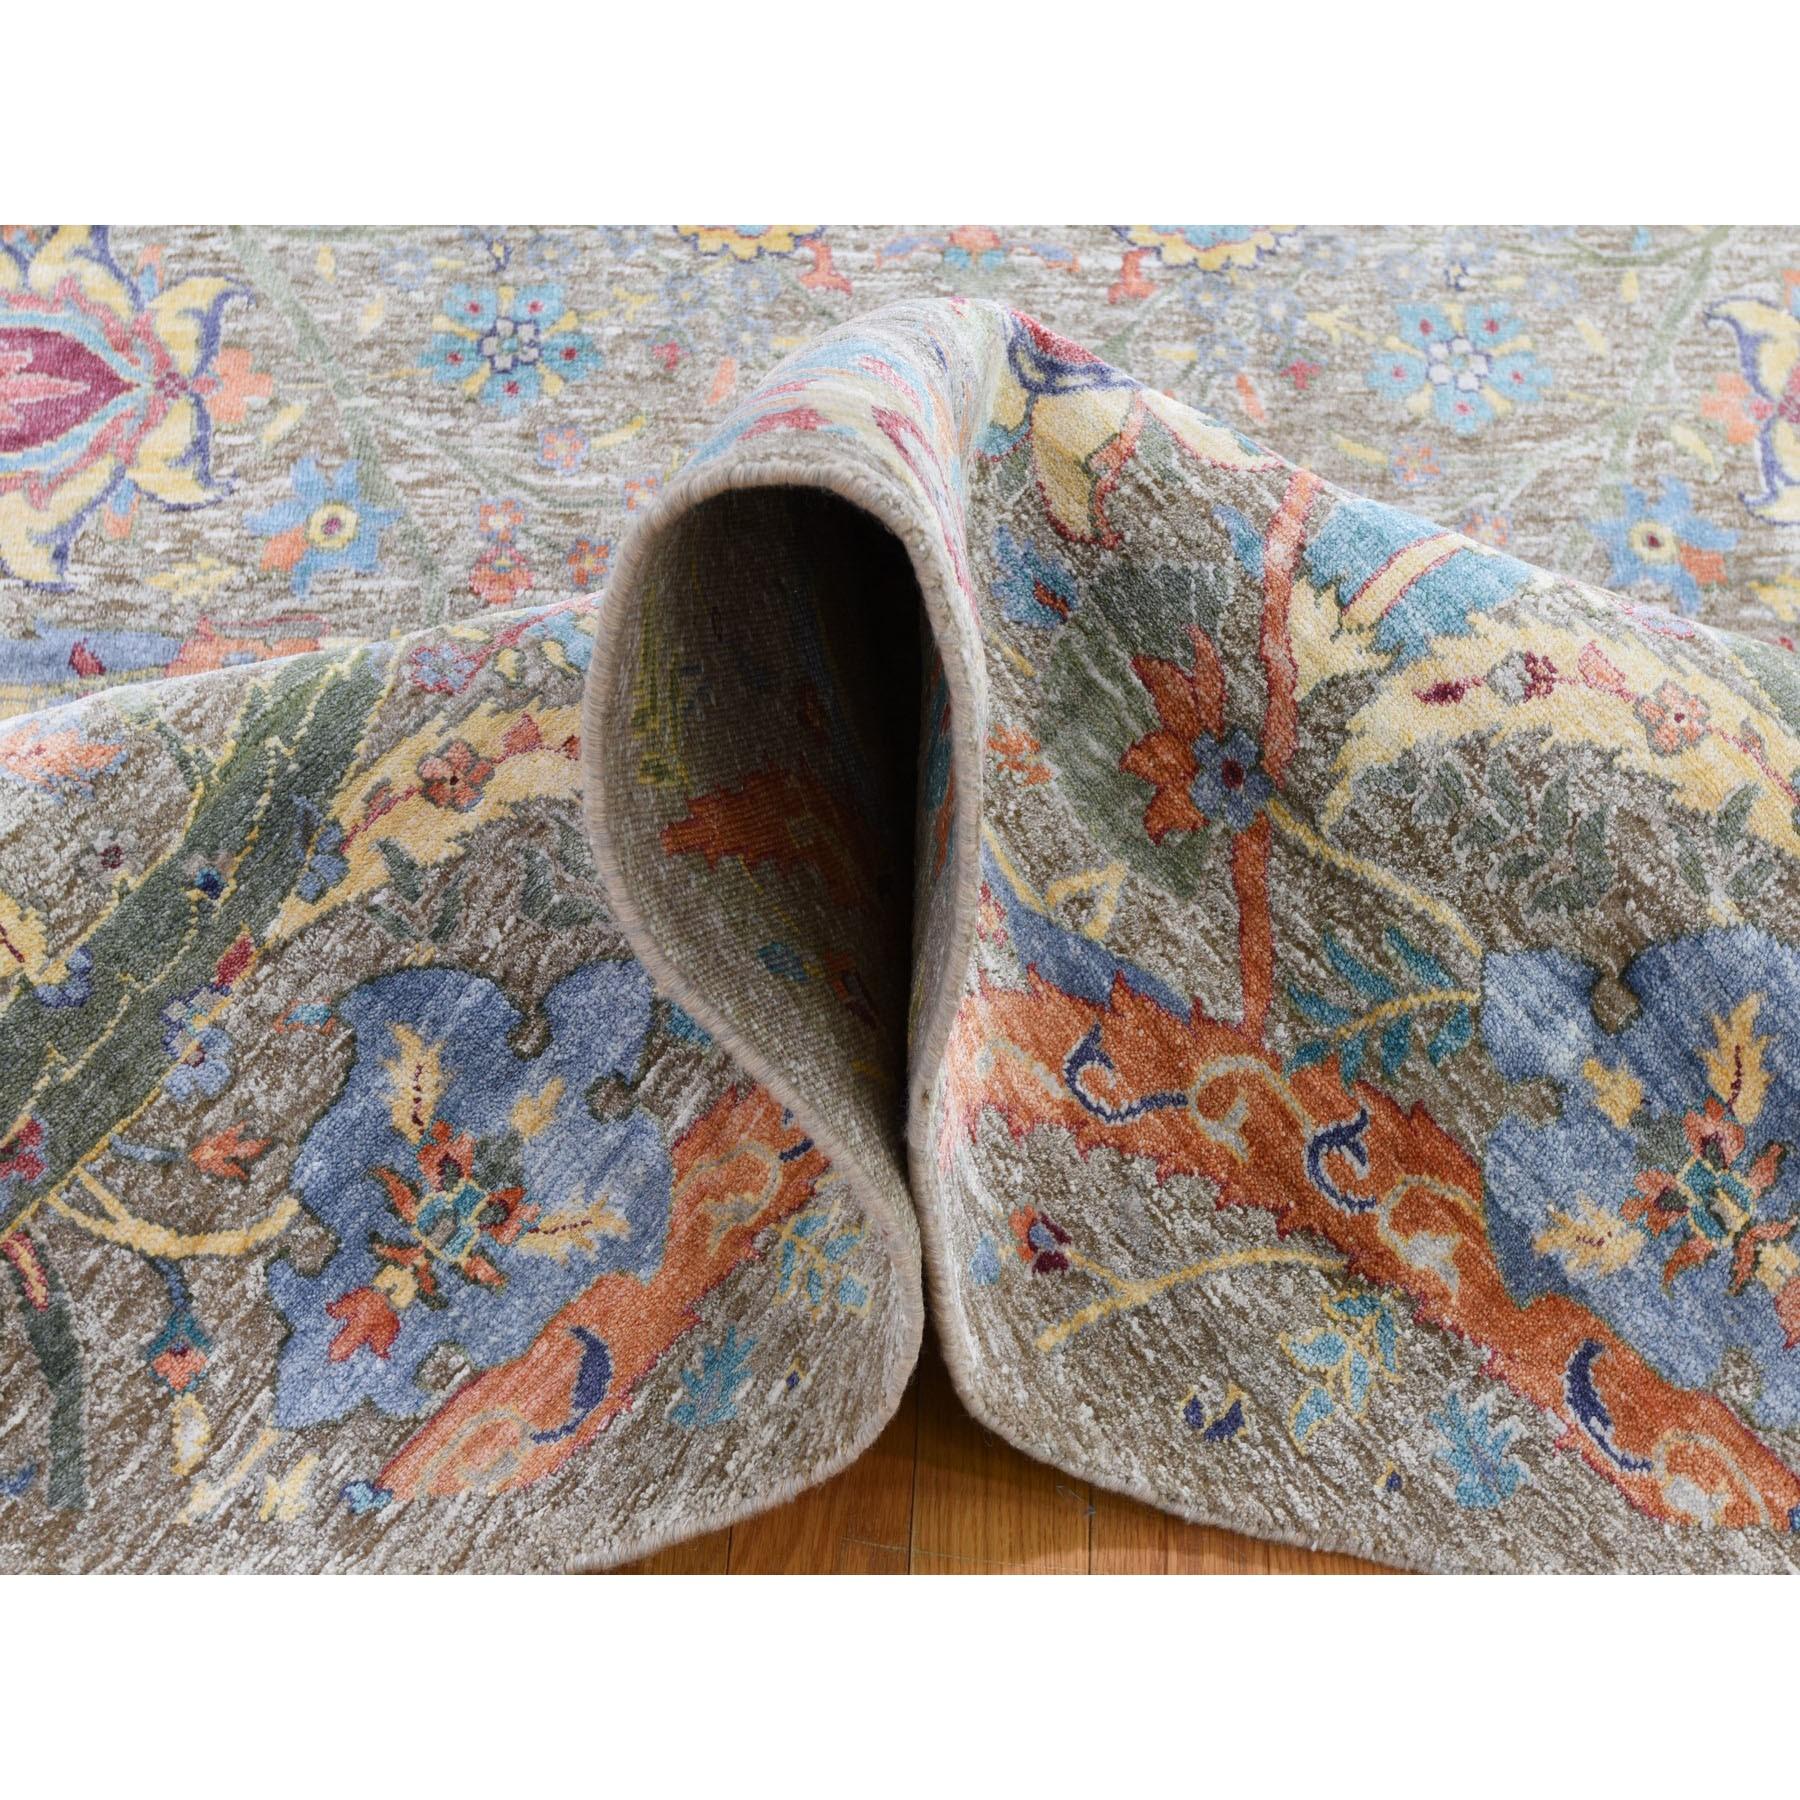 6-x6- Round Sickle Leaf Design Silk With Textured Wool Hand Knotted Oriental Rug